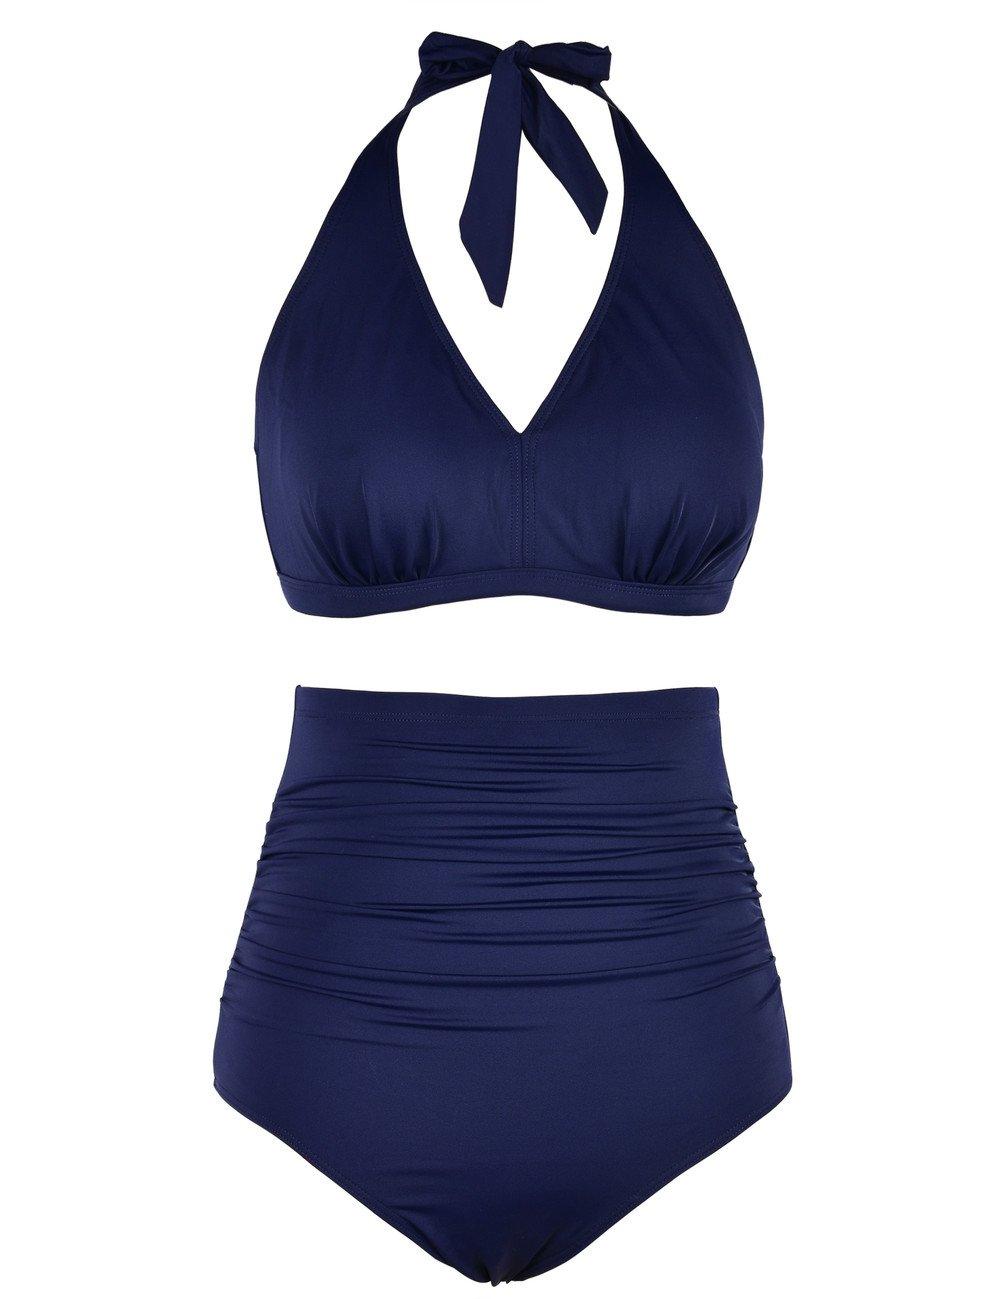 Hilor Women's High Waisted Bikini Bottom V Neck Bikini Top Tankini Set Two Piece Bikinis 14 Navy